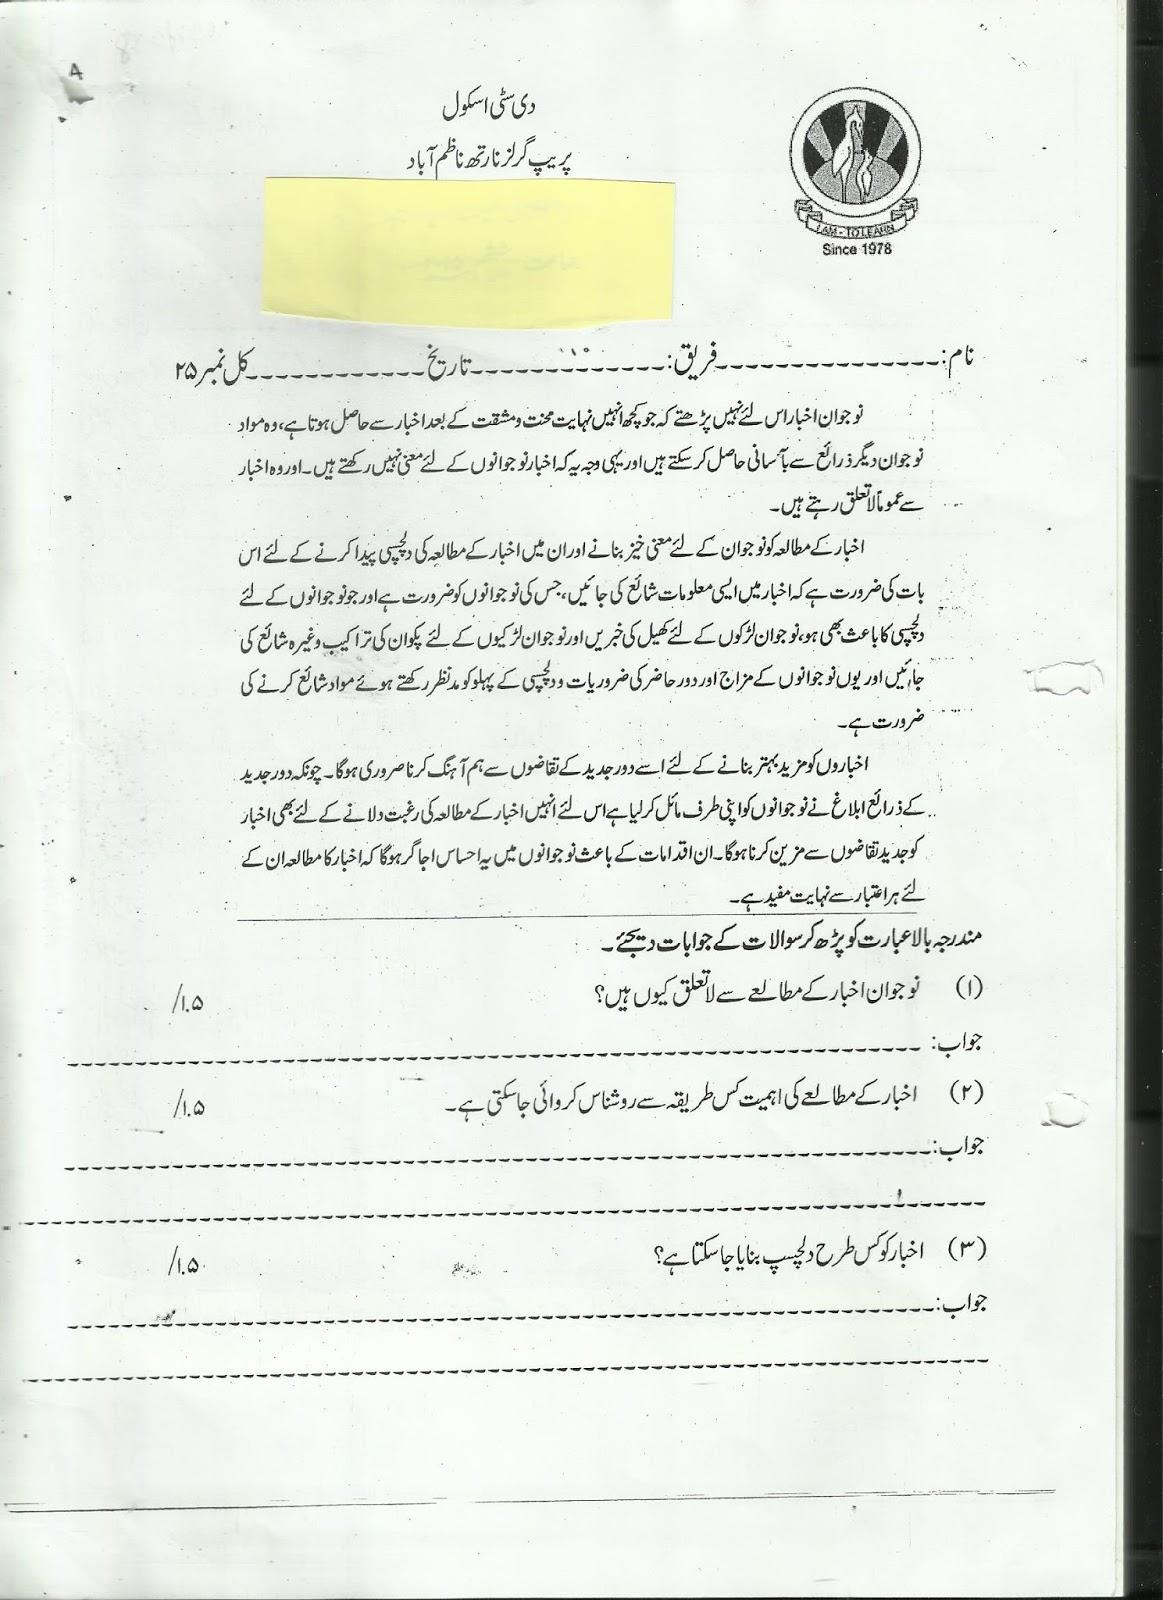 Urdu Tenses Worksheet For Grade 6   Printable Worksheets and Activities for  Teachers [ 1600 x 1163 Pixel ]